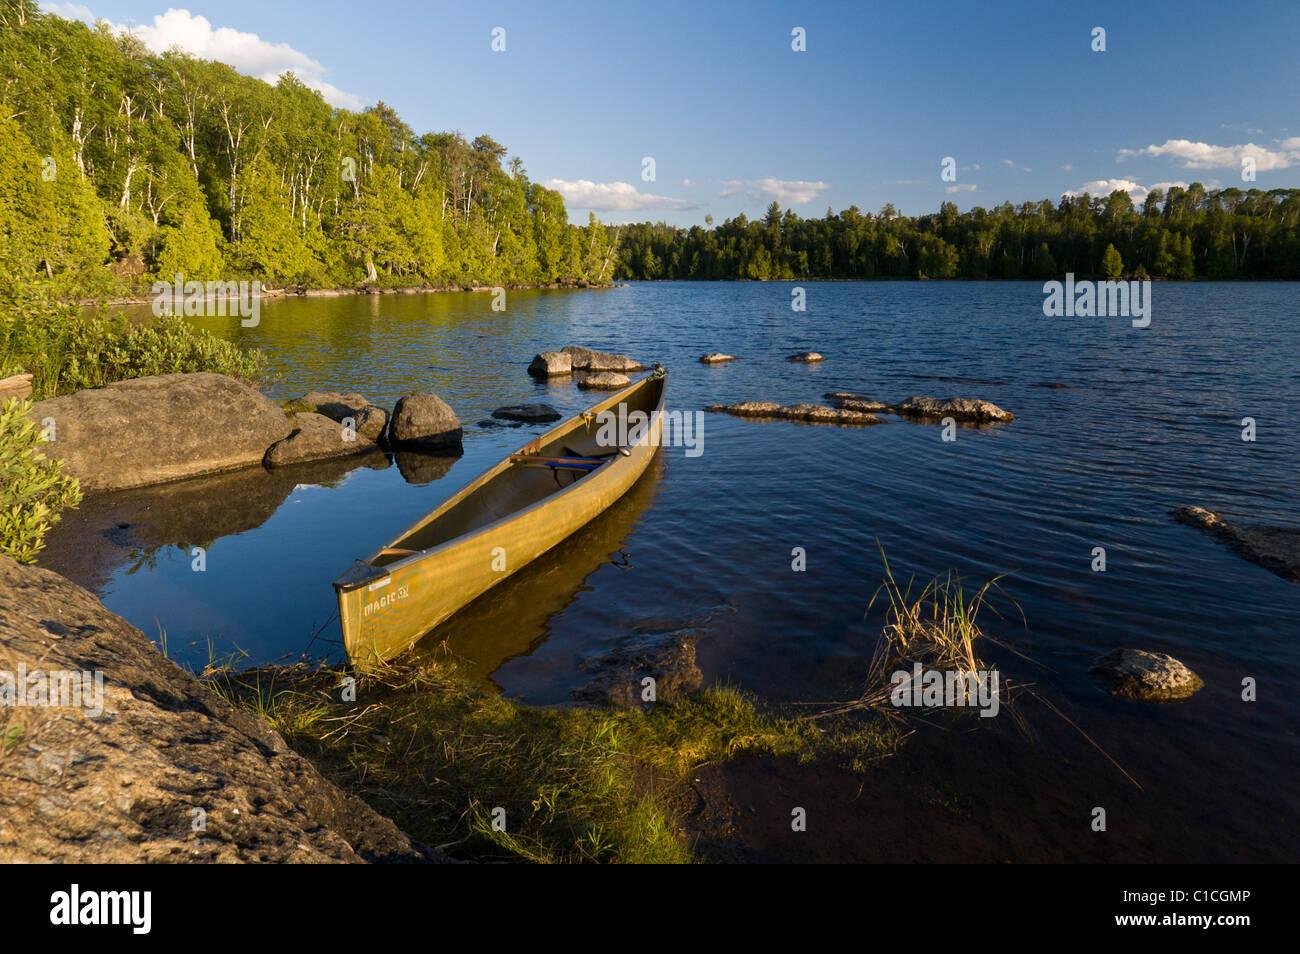 Solo Canoe Stock Photos & Solo Canoe Stock Images - Alamy